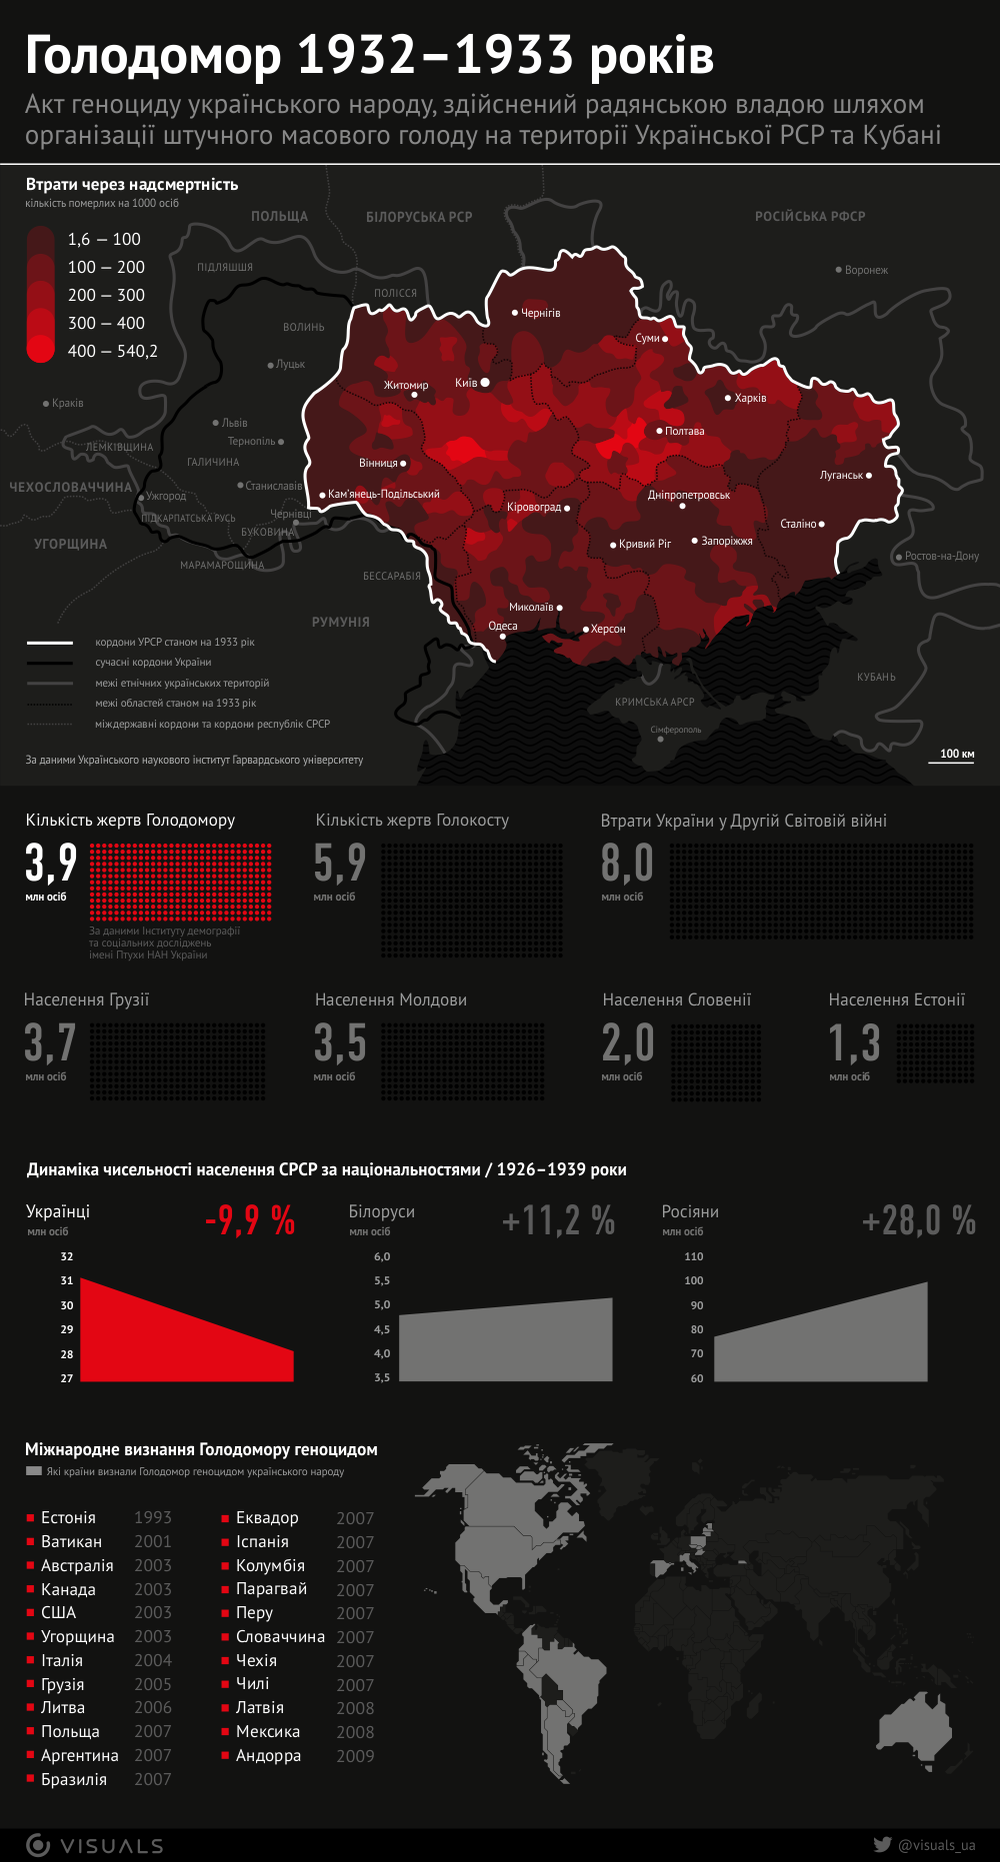 голодомор на Донбассе